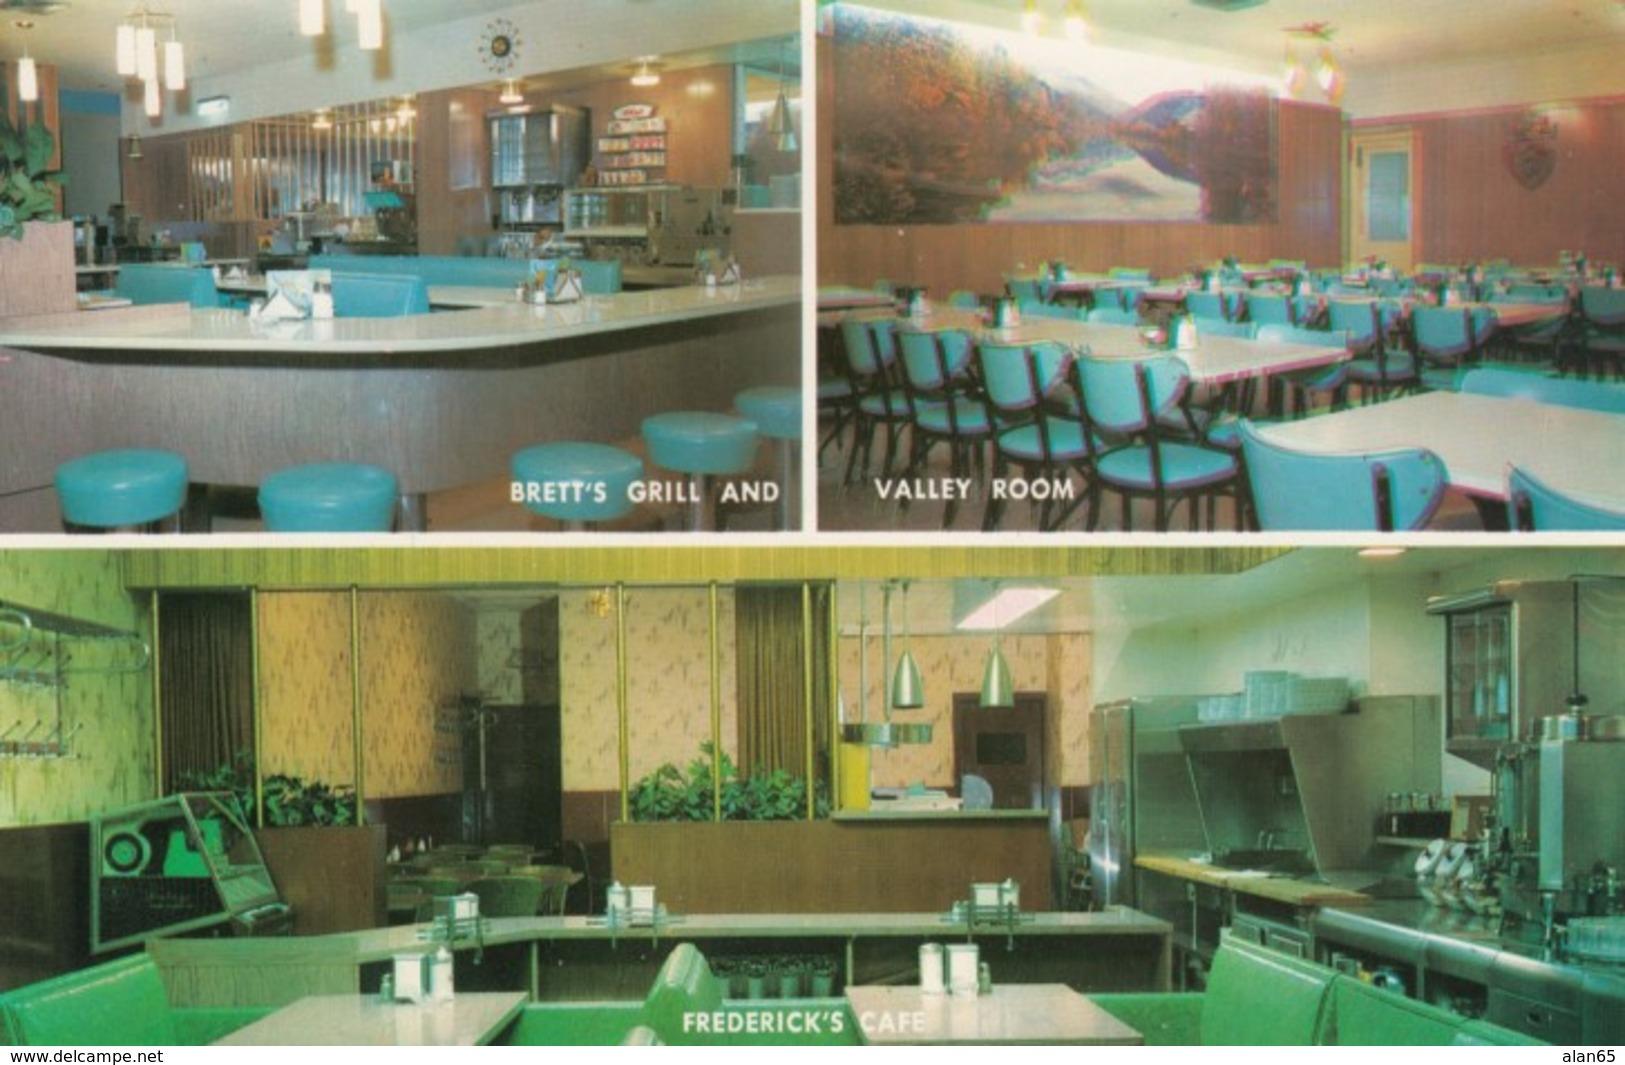 Mankato Minnesota, Happy Chef Fredericks Cafe, Bretts Grill & Valley Room Restaurants Interior, C1960s Vintage Postcard - United States